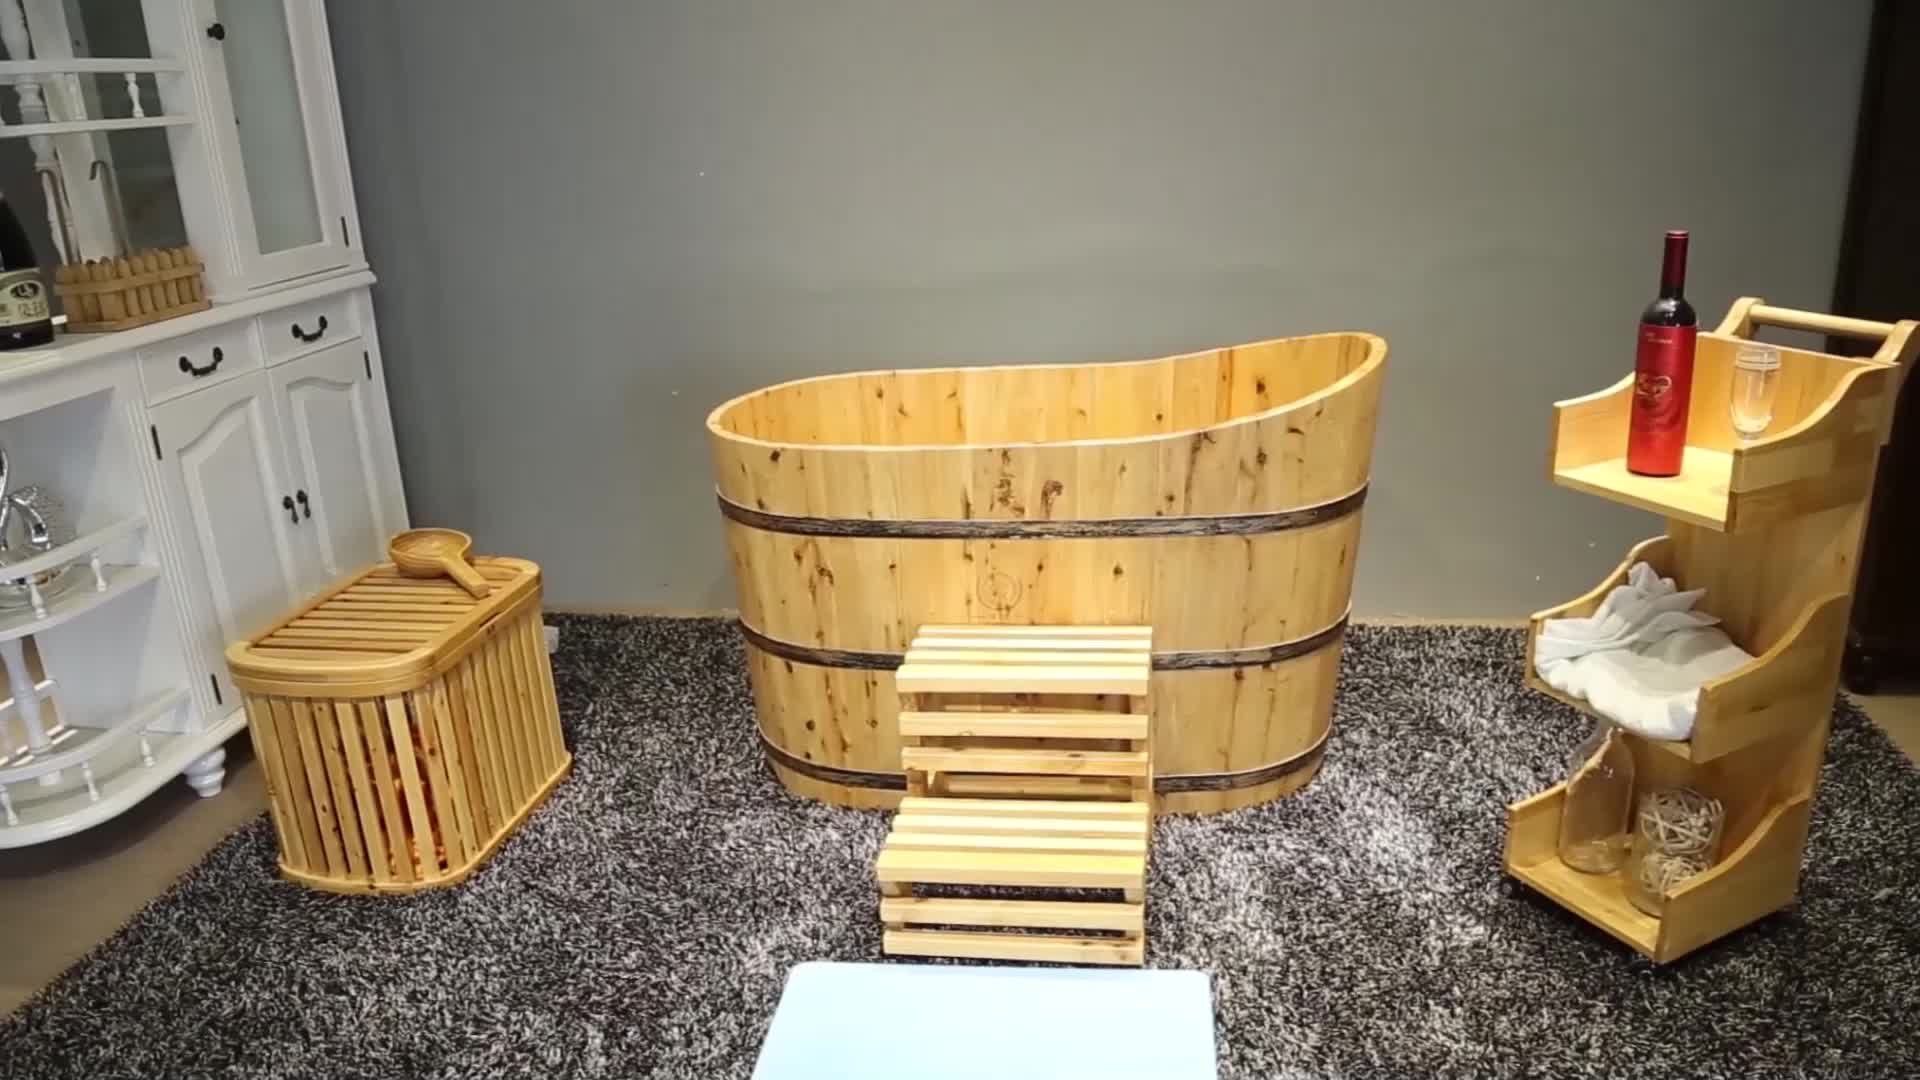 Wooden barrel 1 Person Hot Sauna Massager Tub Japanese Portable Cedar Wooden bathtub